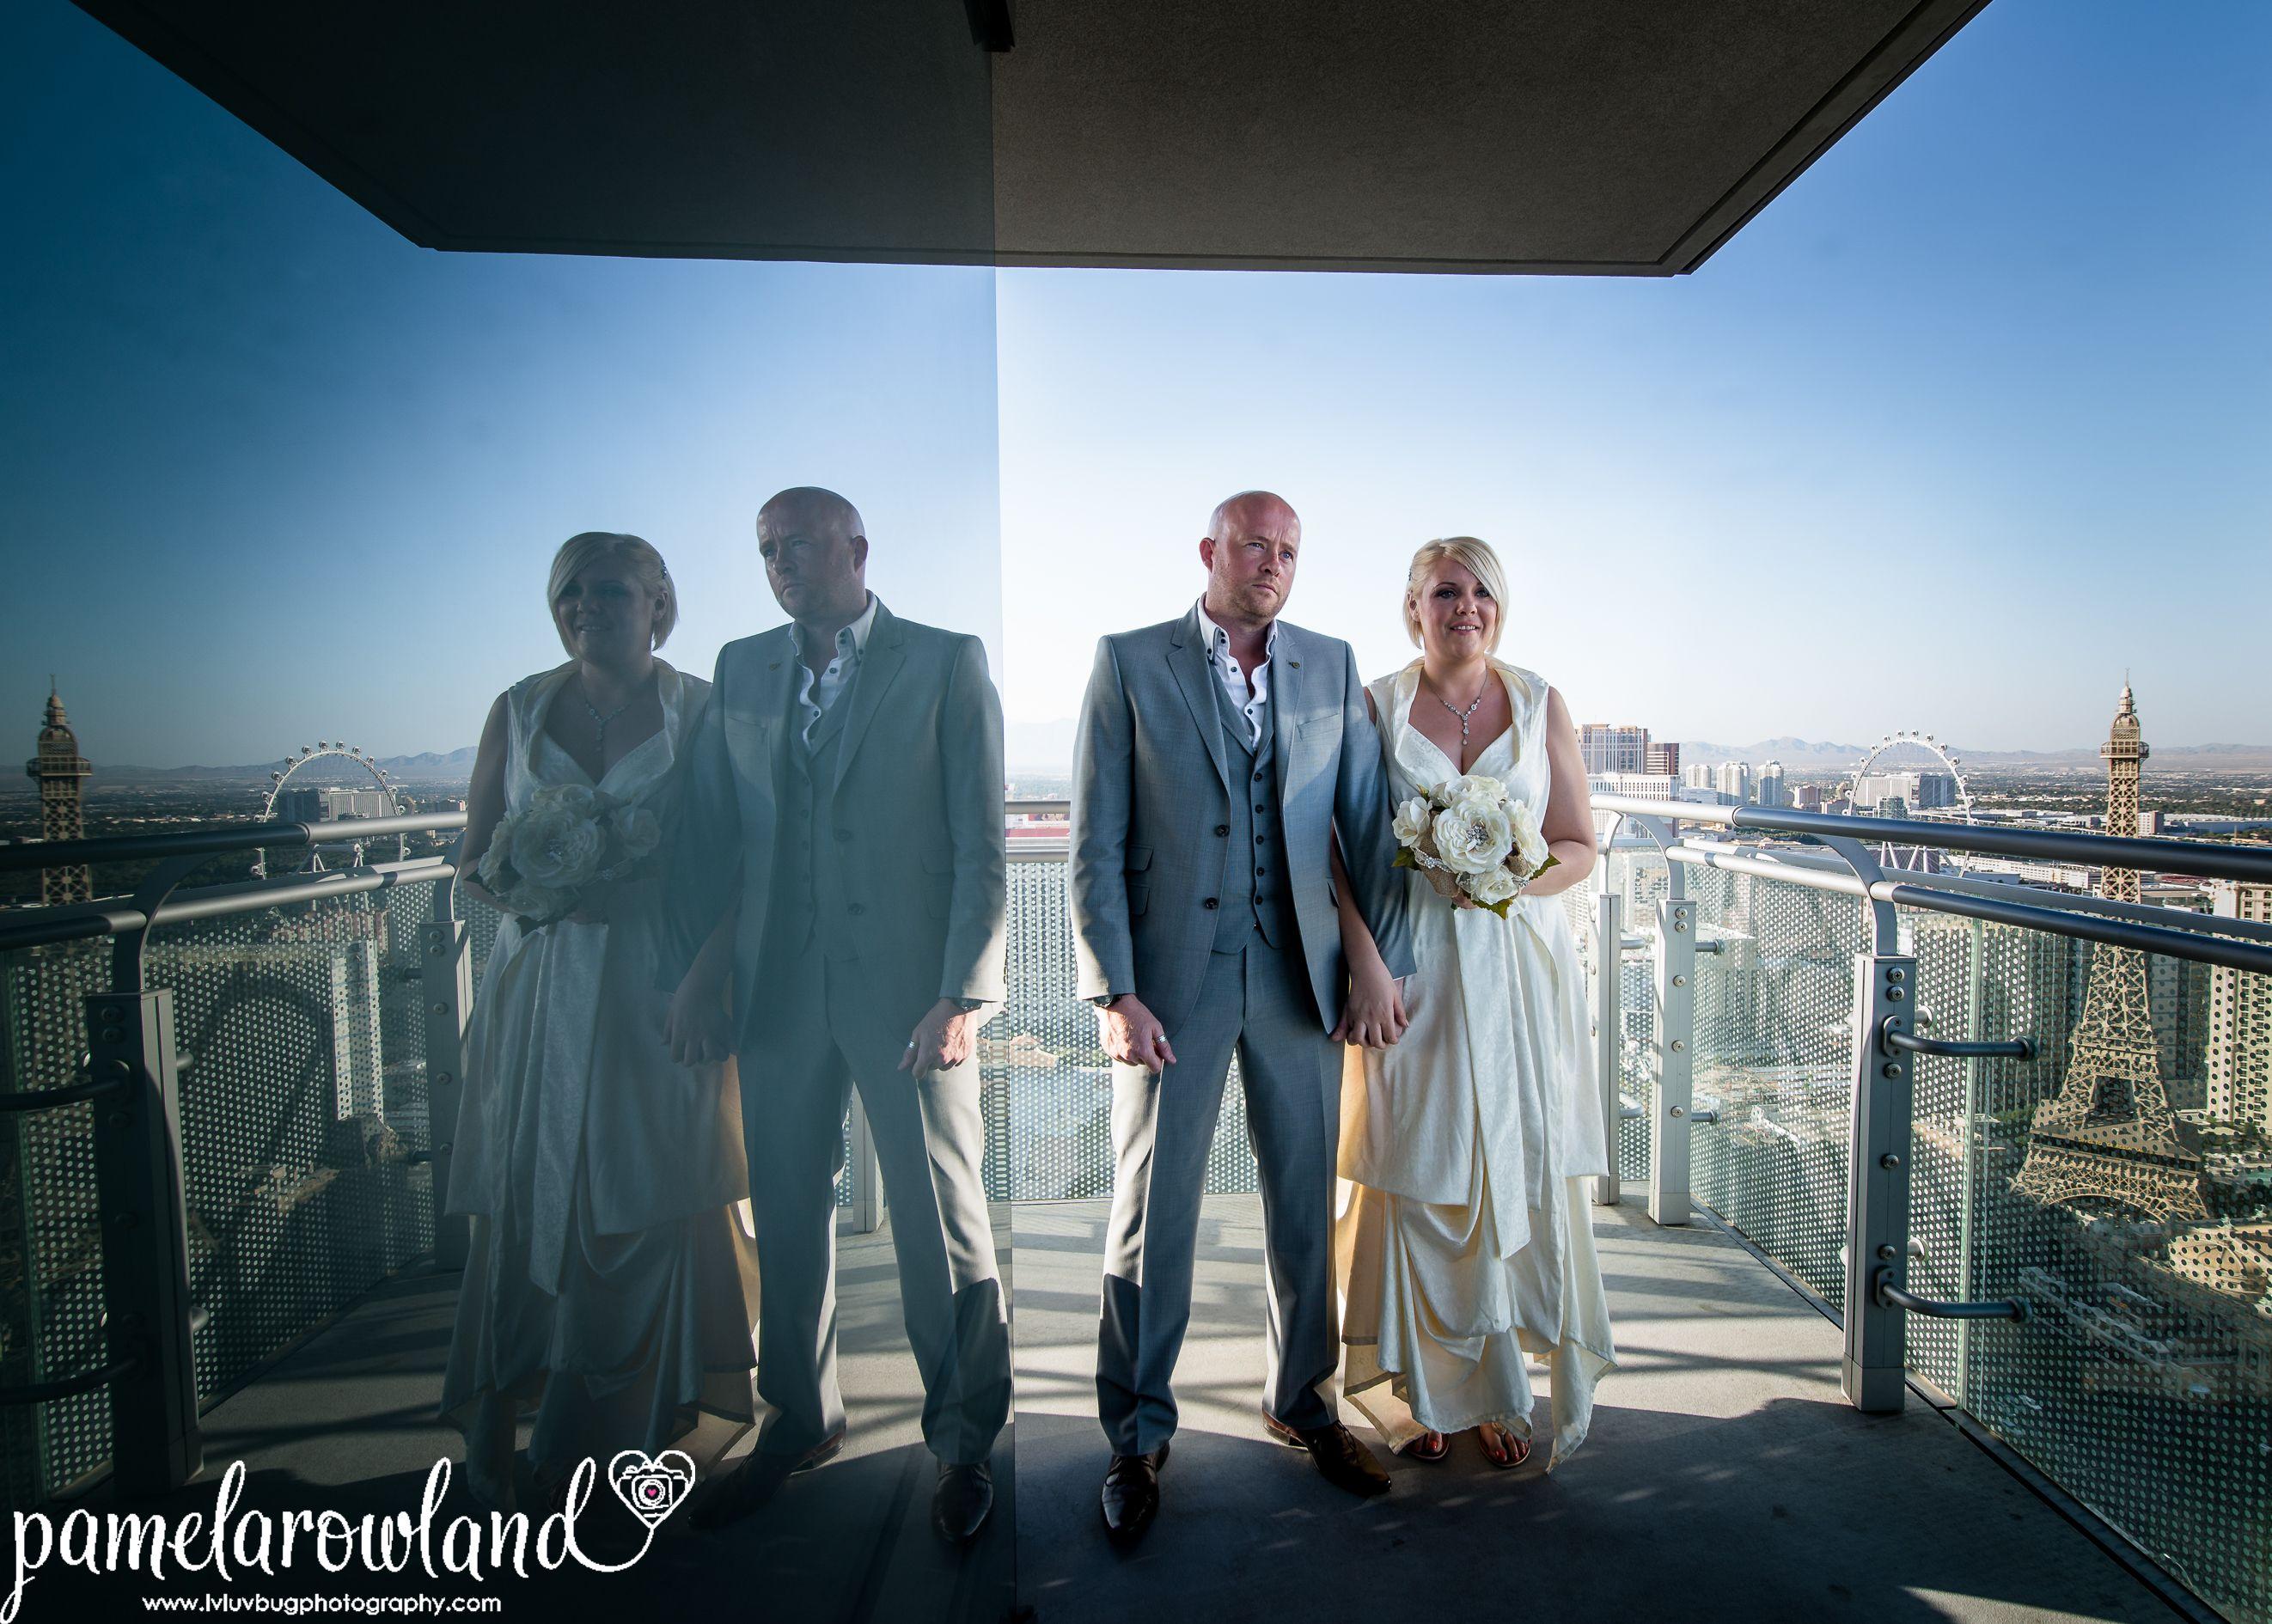 Las Vegas Luv Bug Wedding Ceremony On A Cosmopolitan Balcony Photo Lasvegasluvbug Pam